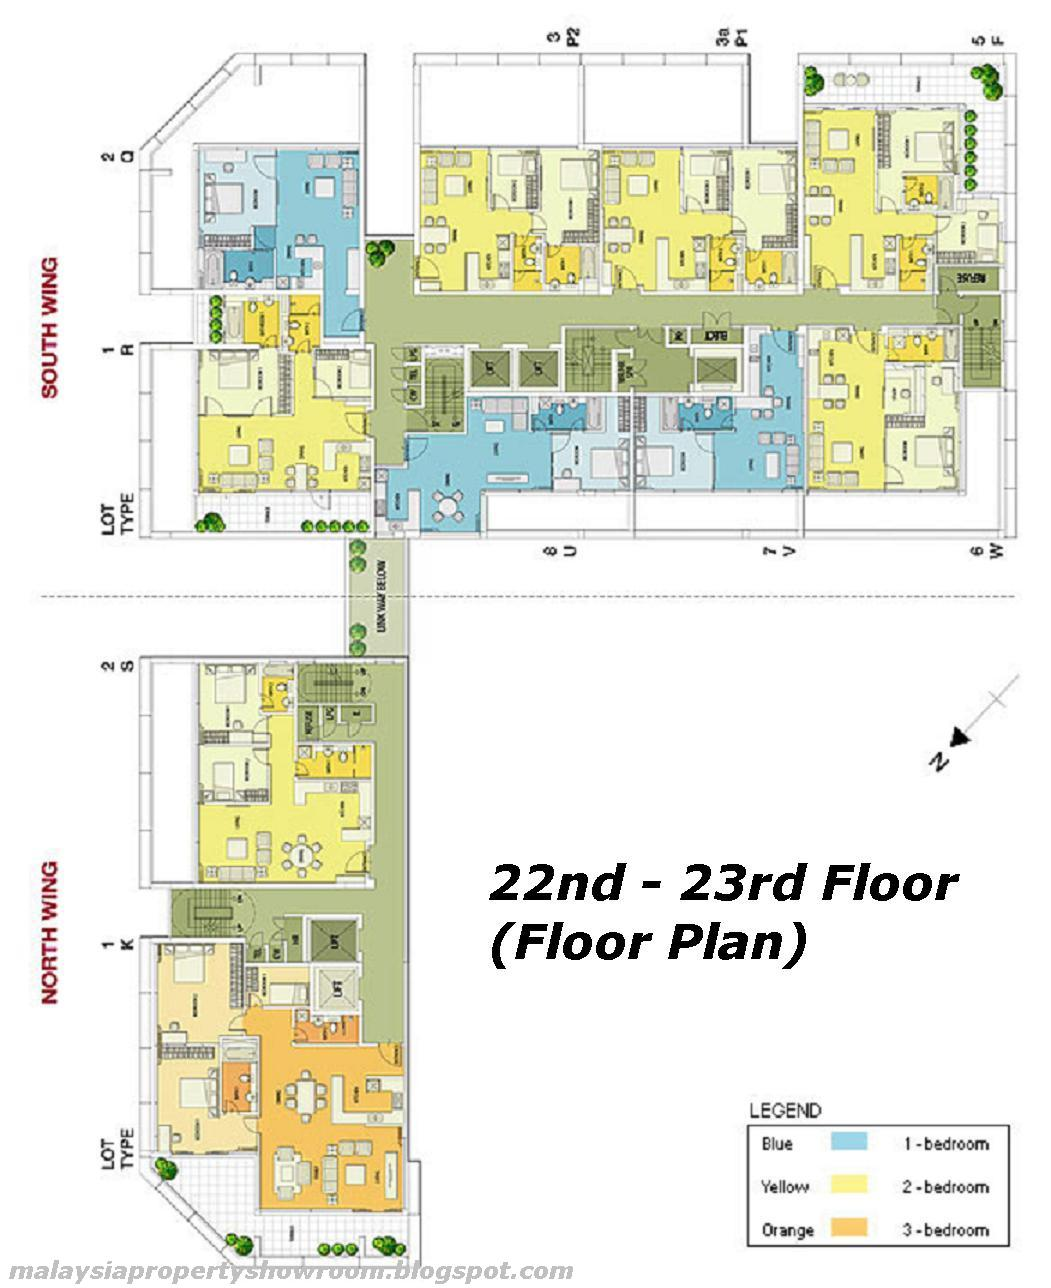 Fairlane Apartments: Bintang Fairlane Residences